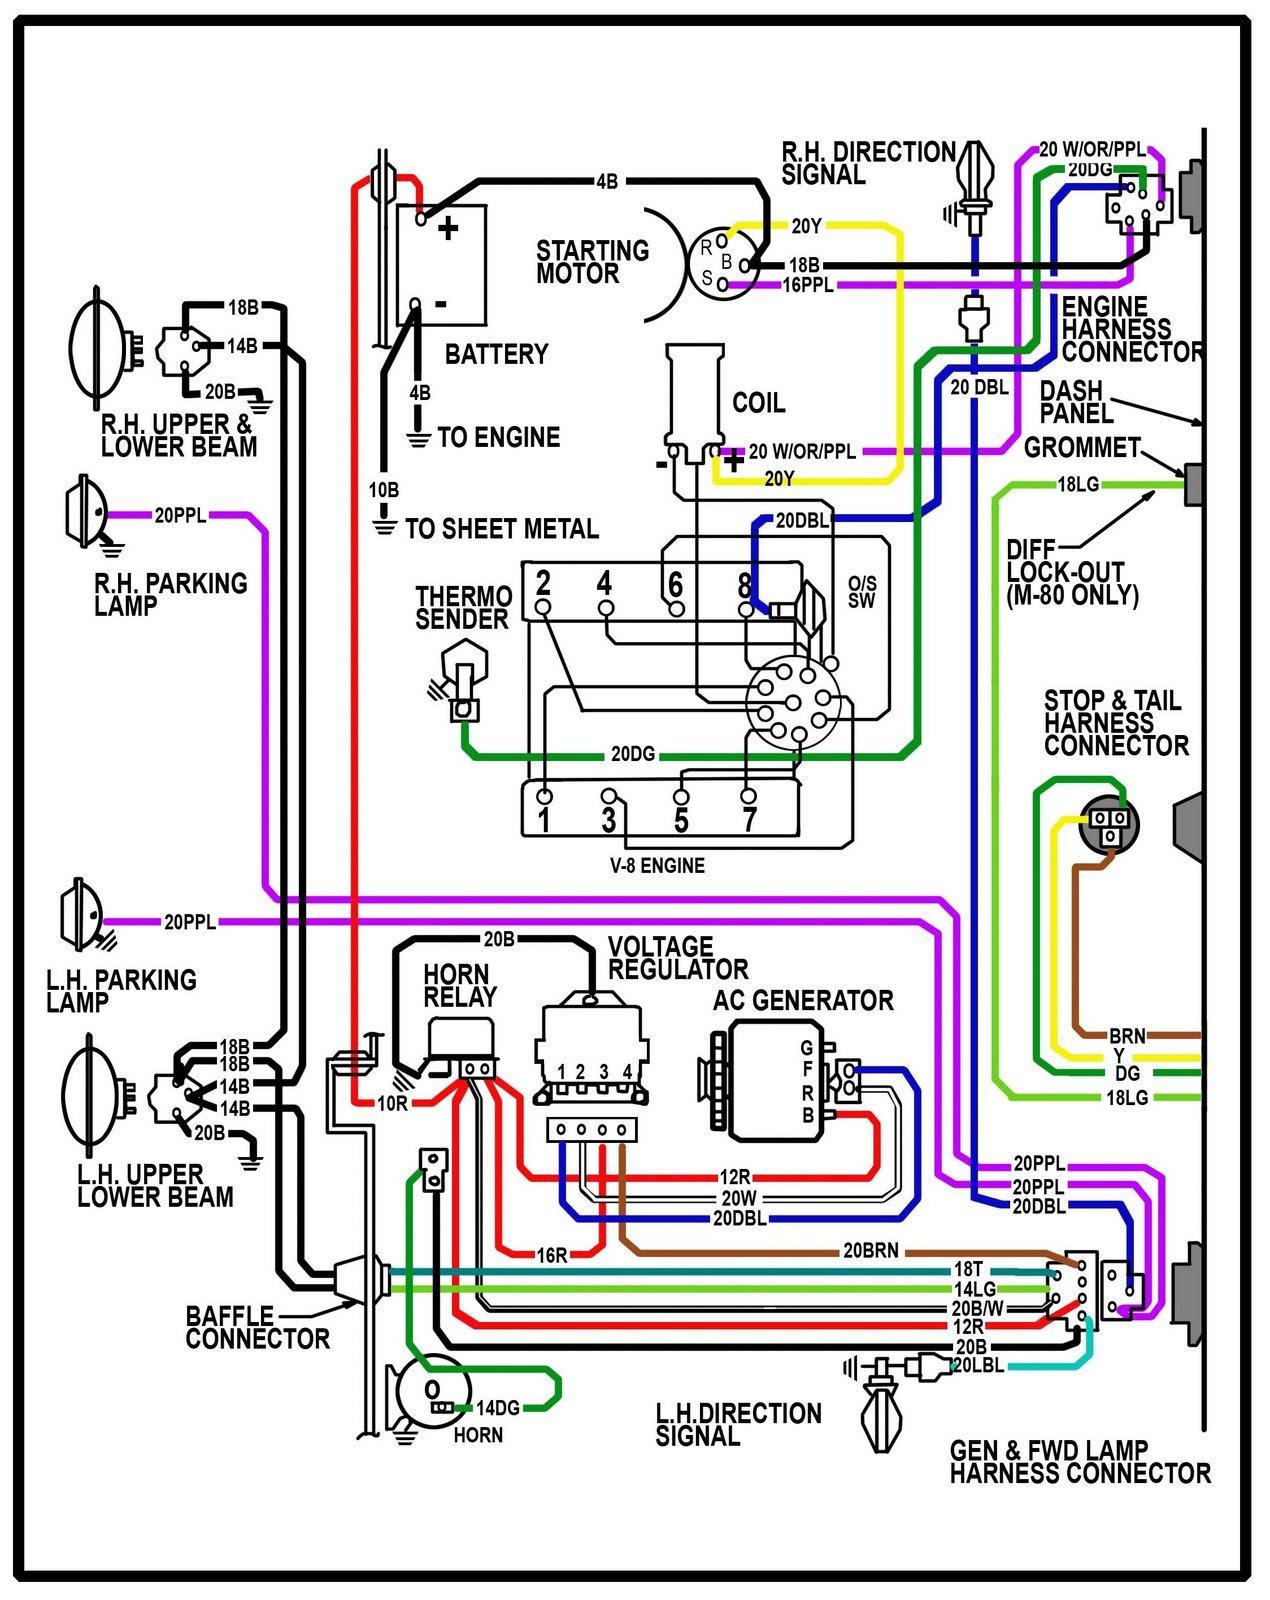 Wiring Diagram For 1968 Chevy Truck Parker Guitar Wiring Diagram Bathroom Vents Yenpancane Jeanjaures37 Fr